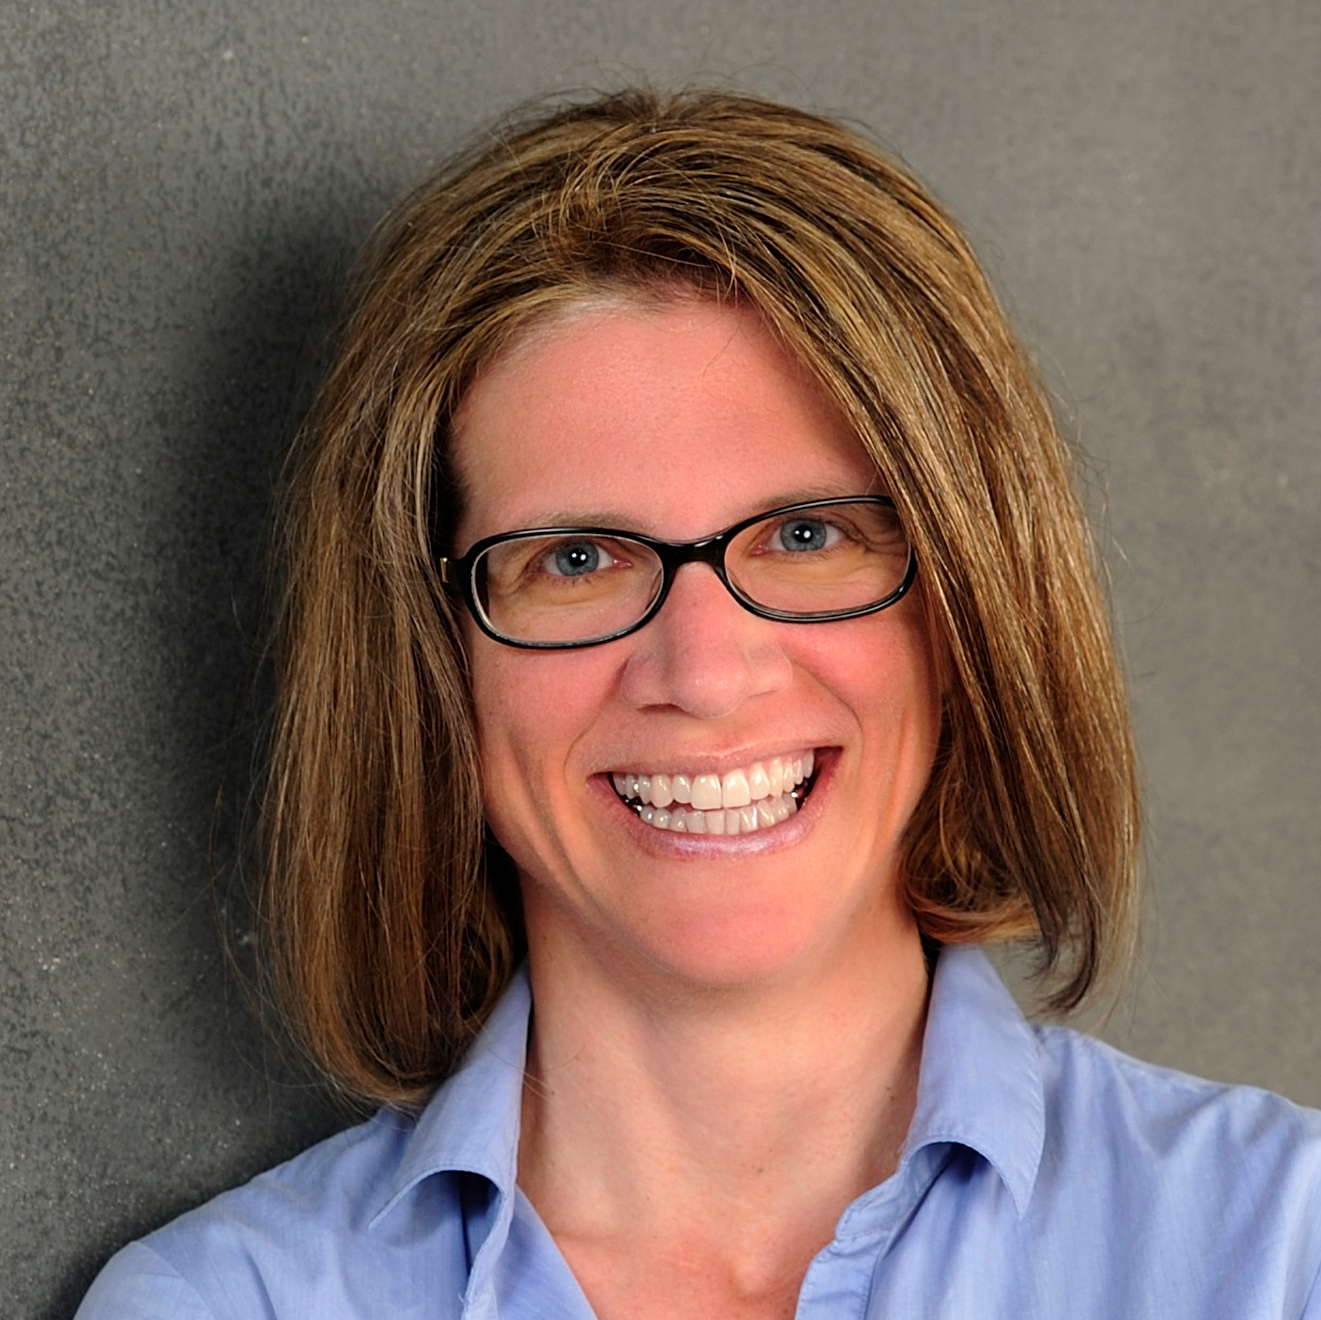 DAPR-Programm-Managerin Annette Bouteiller